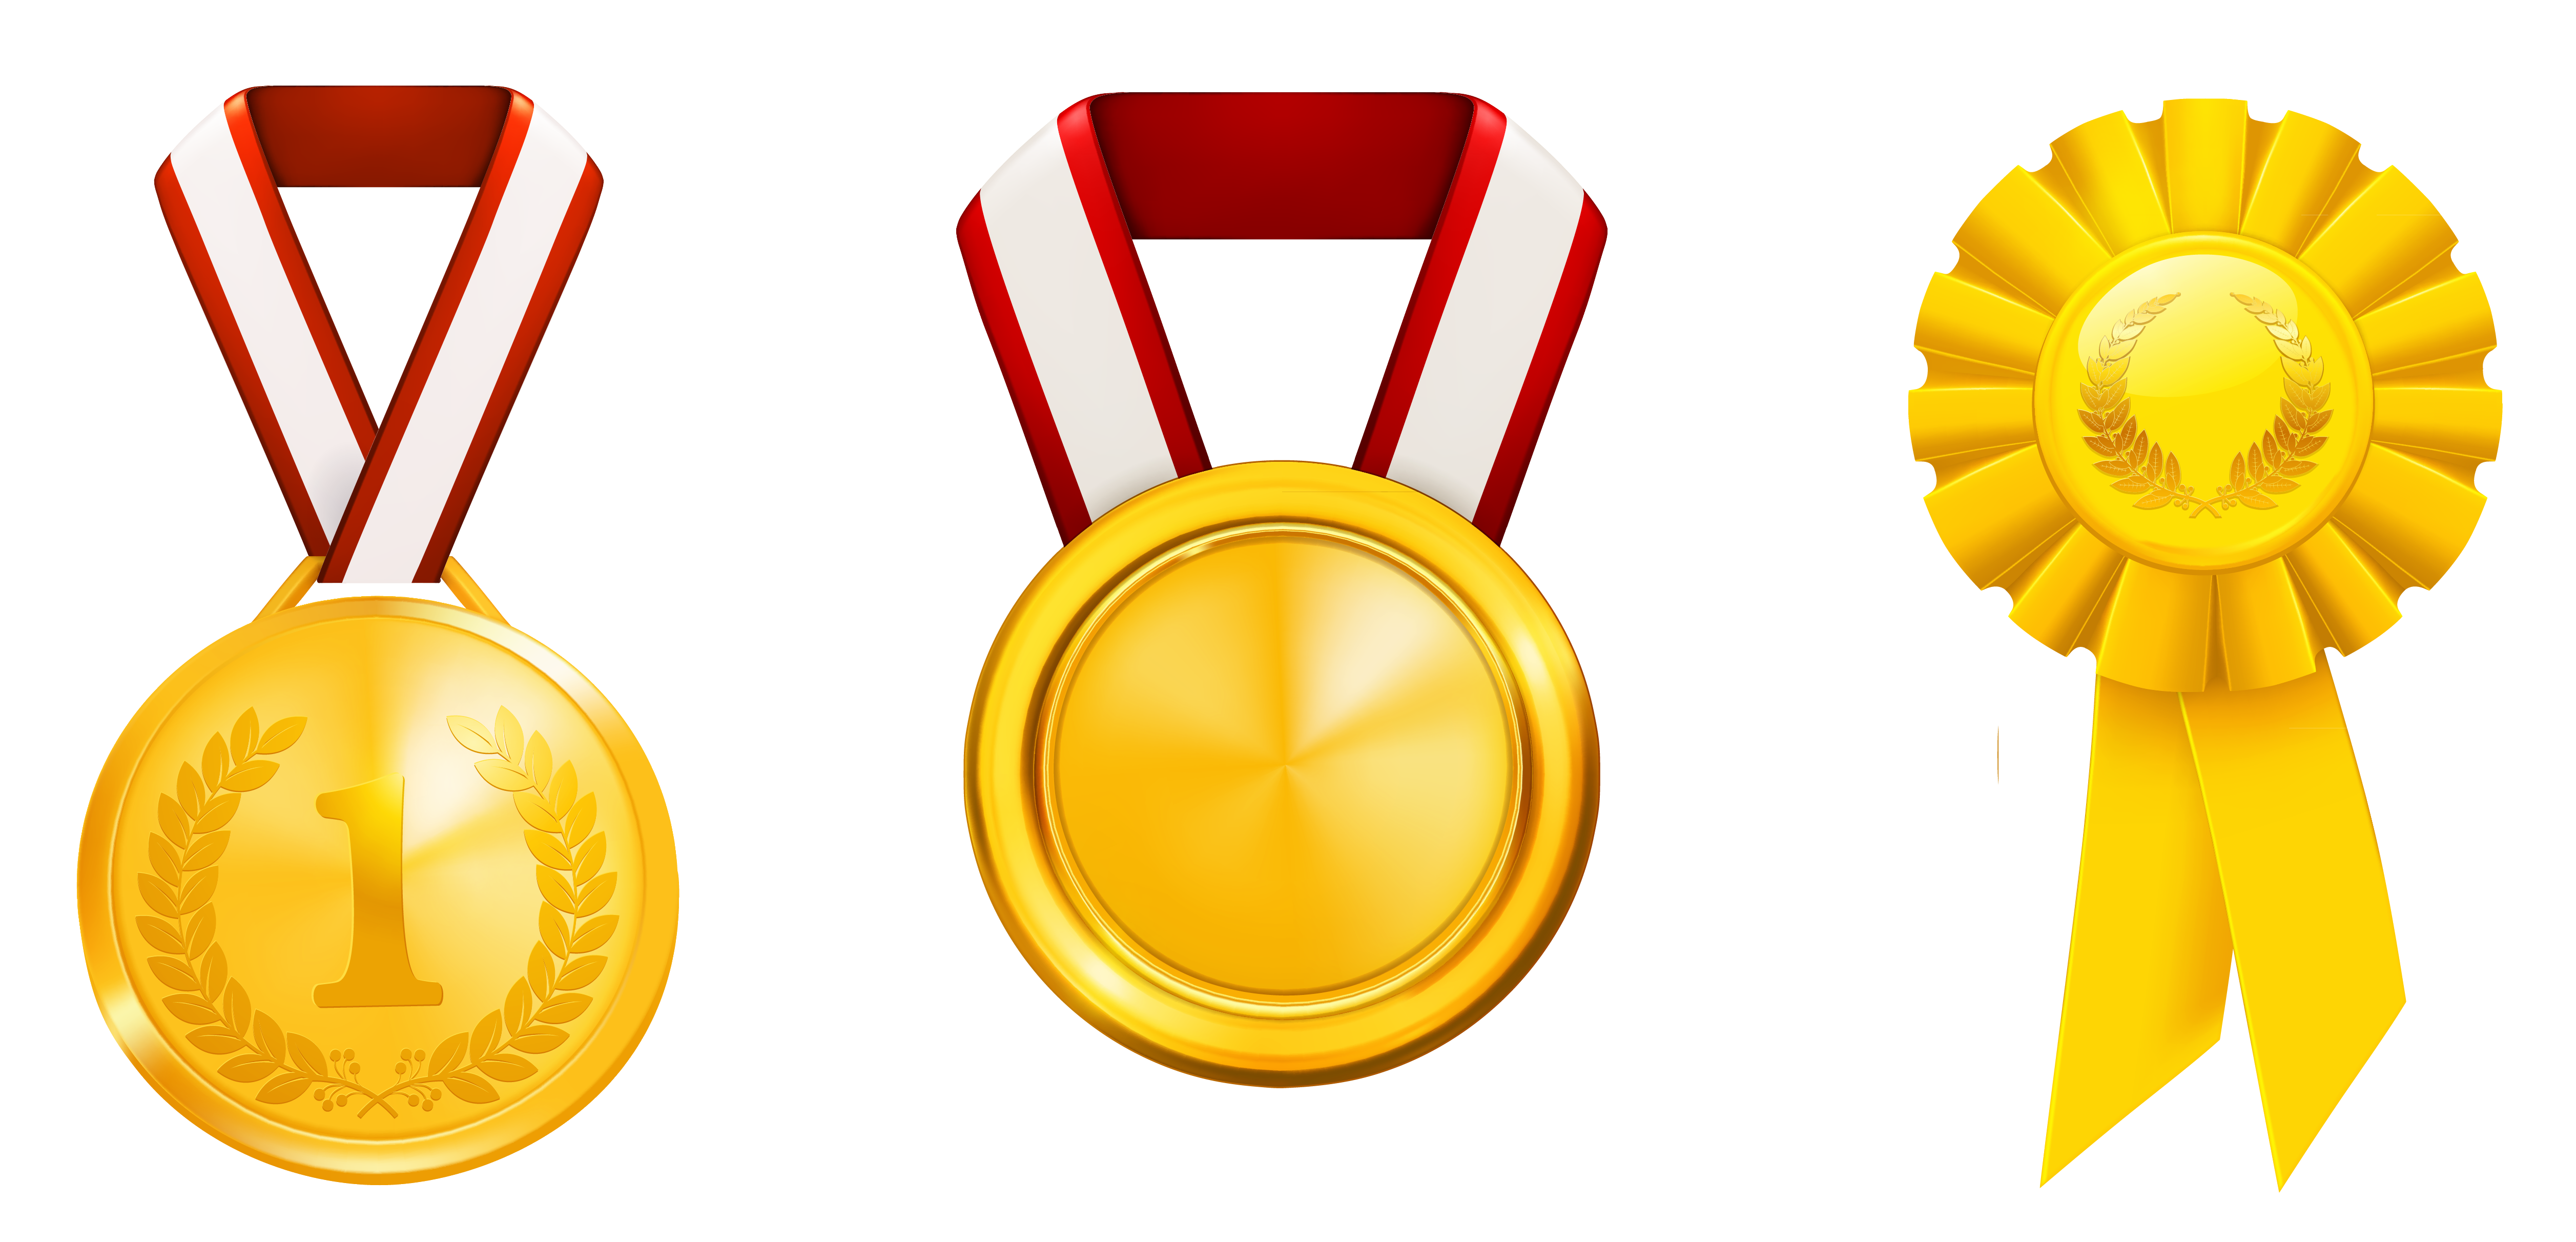 Honoring desktop backgrounds prizes. Prize clipart prize day